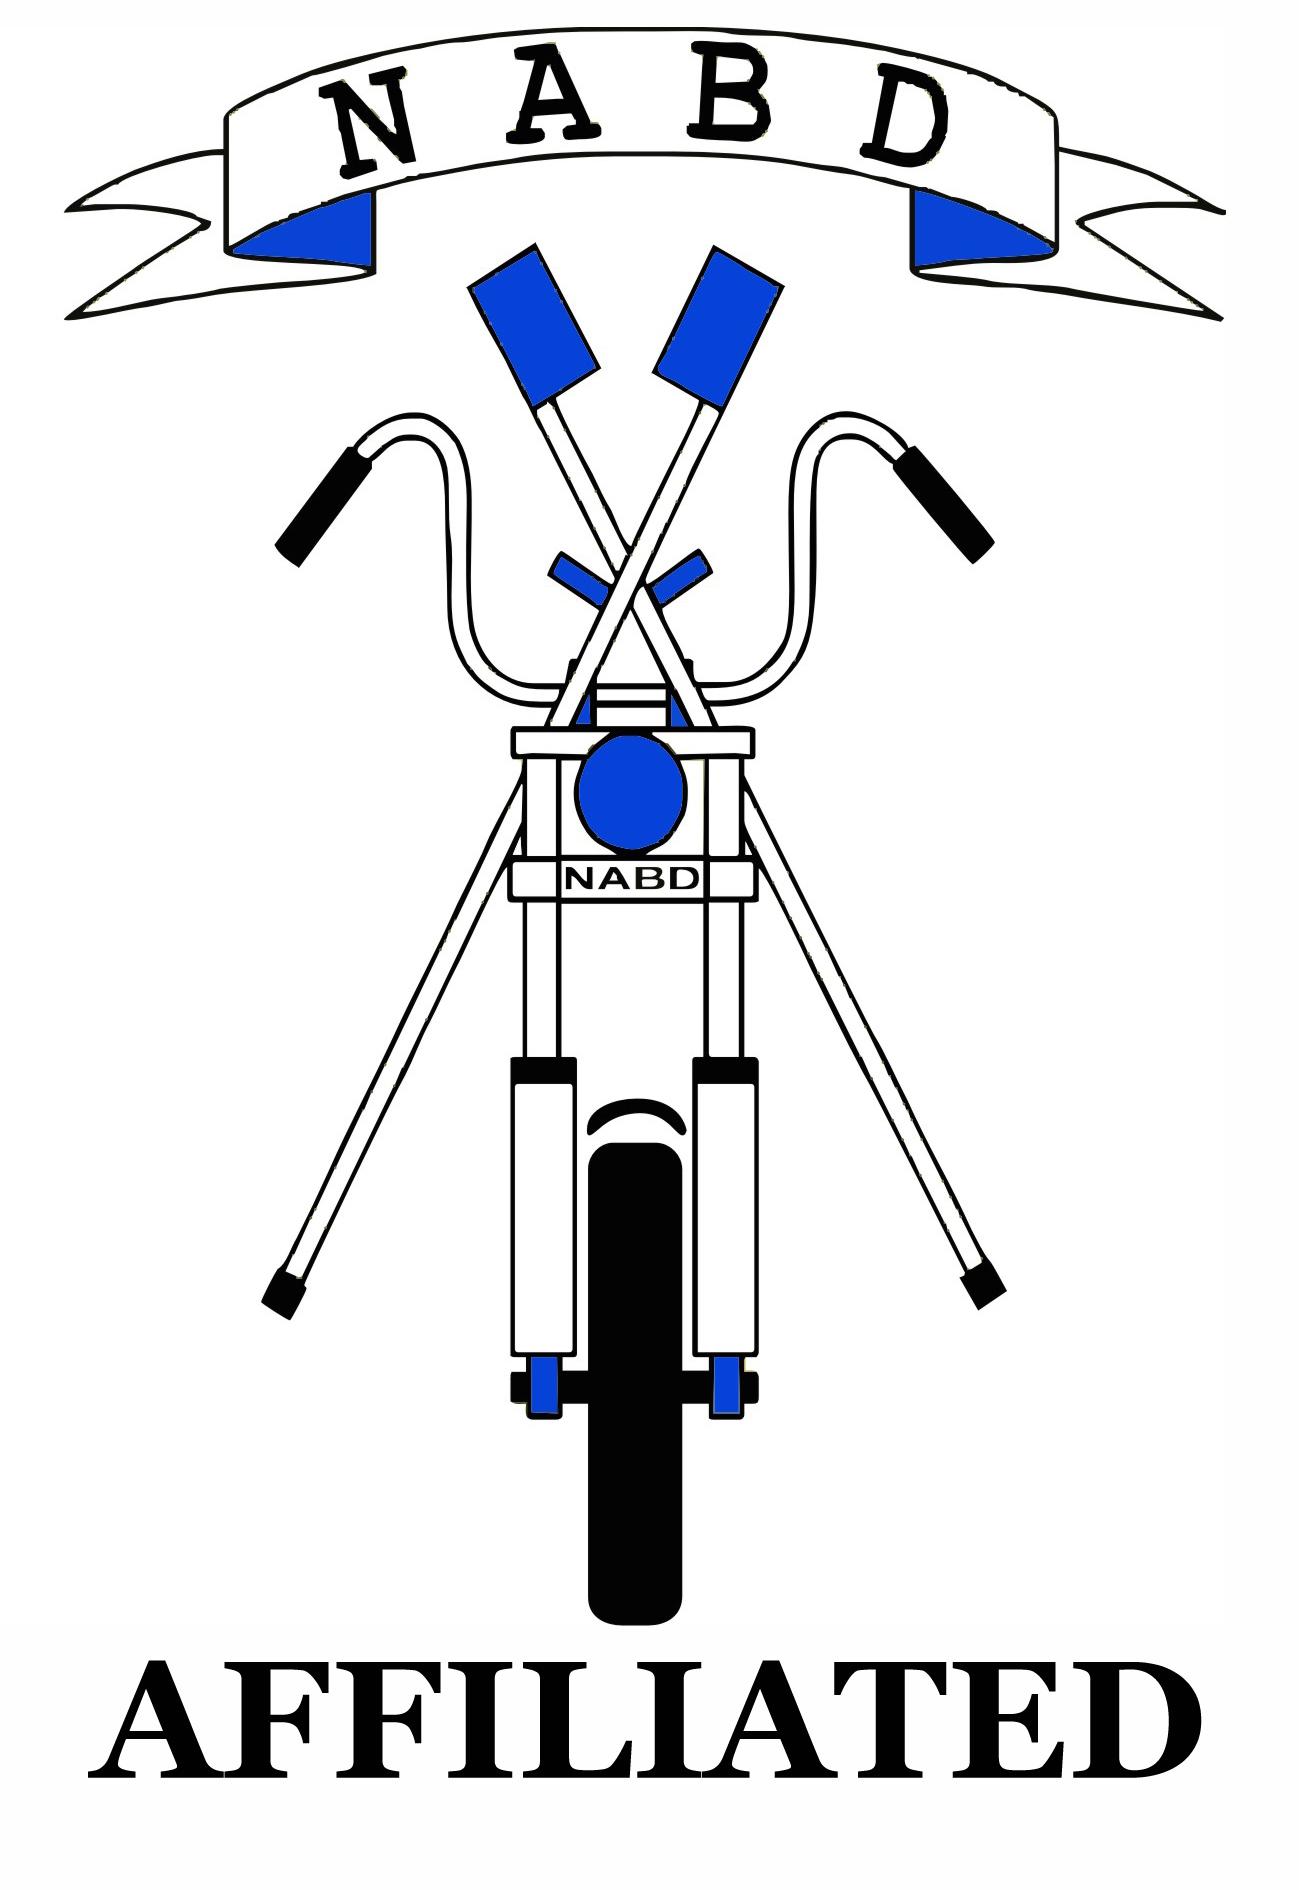 Motorbike Alliance